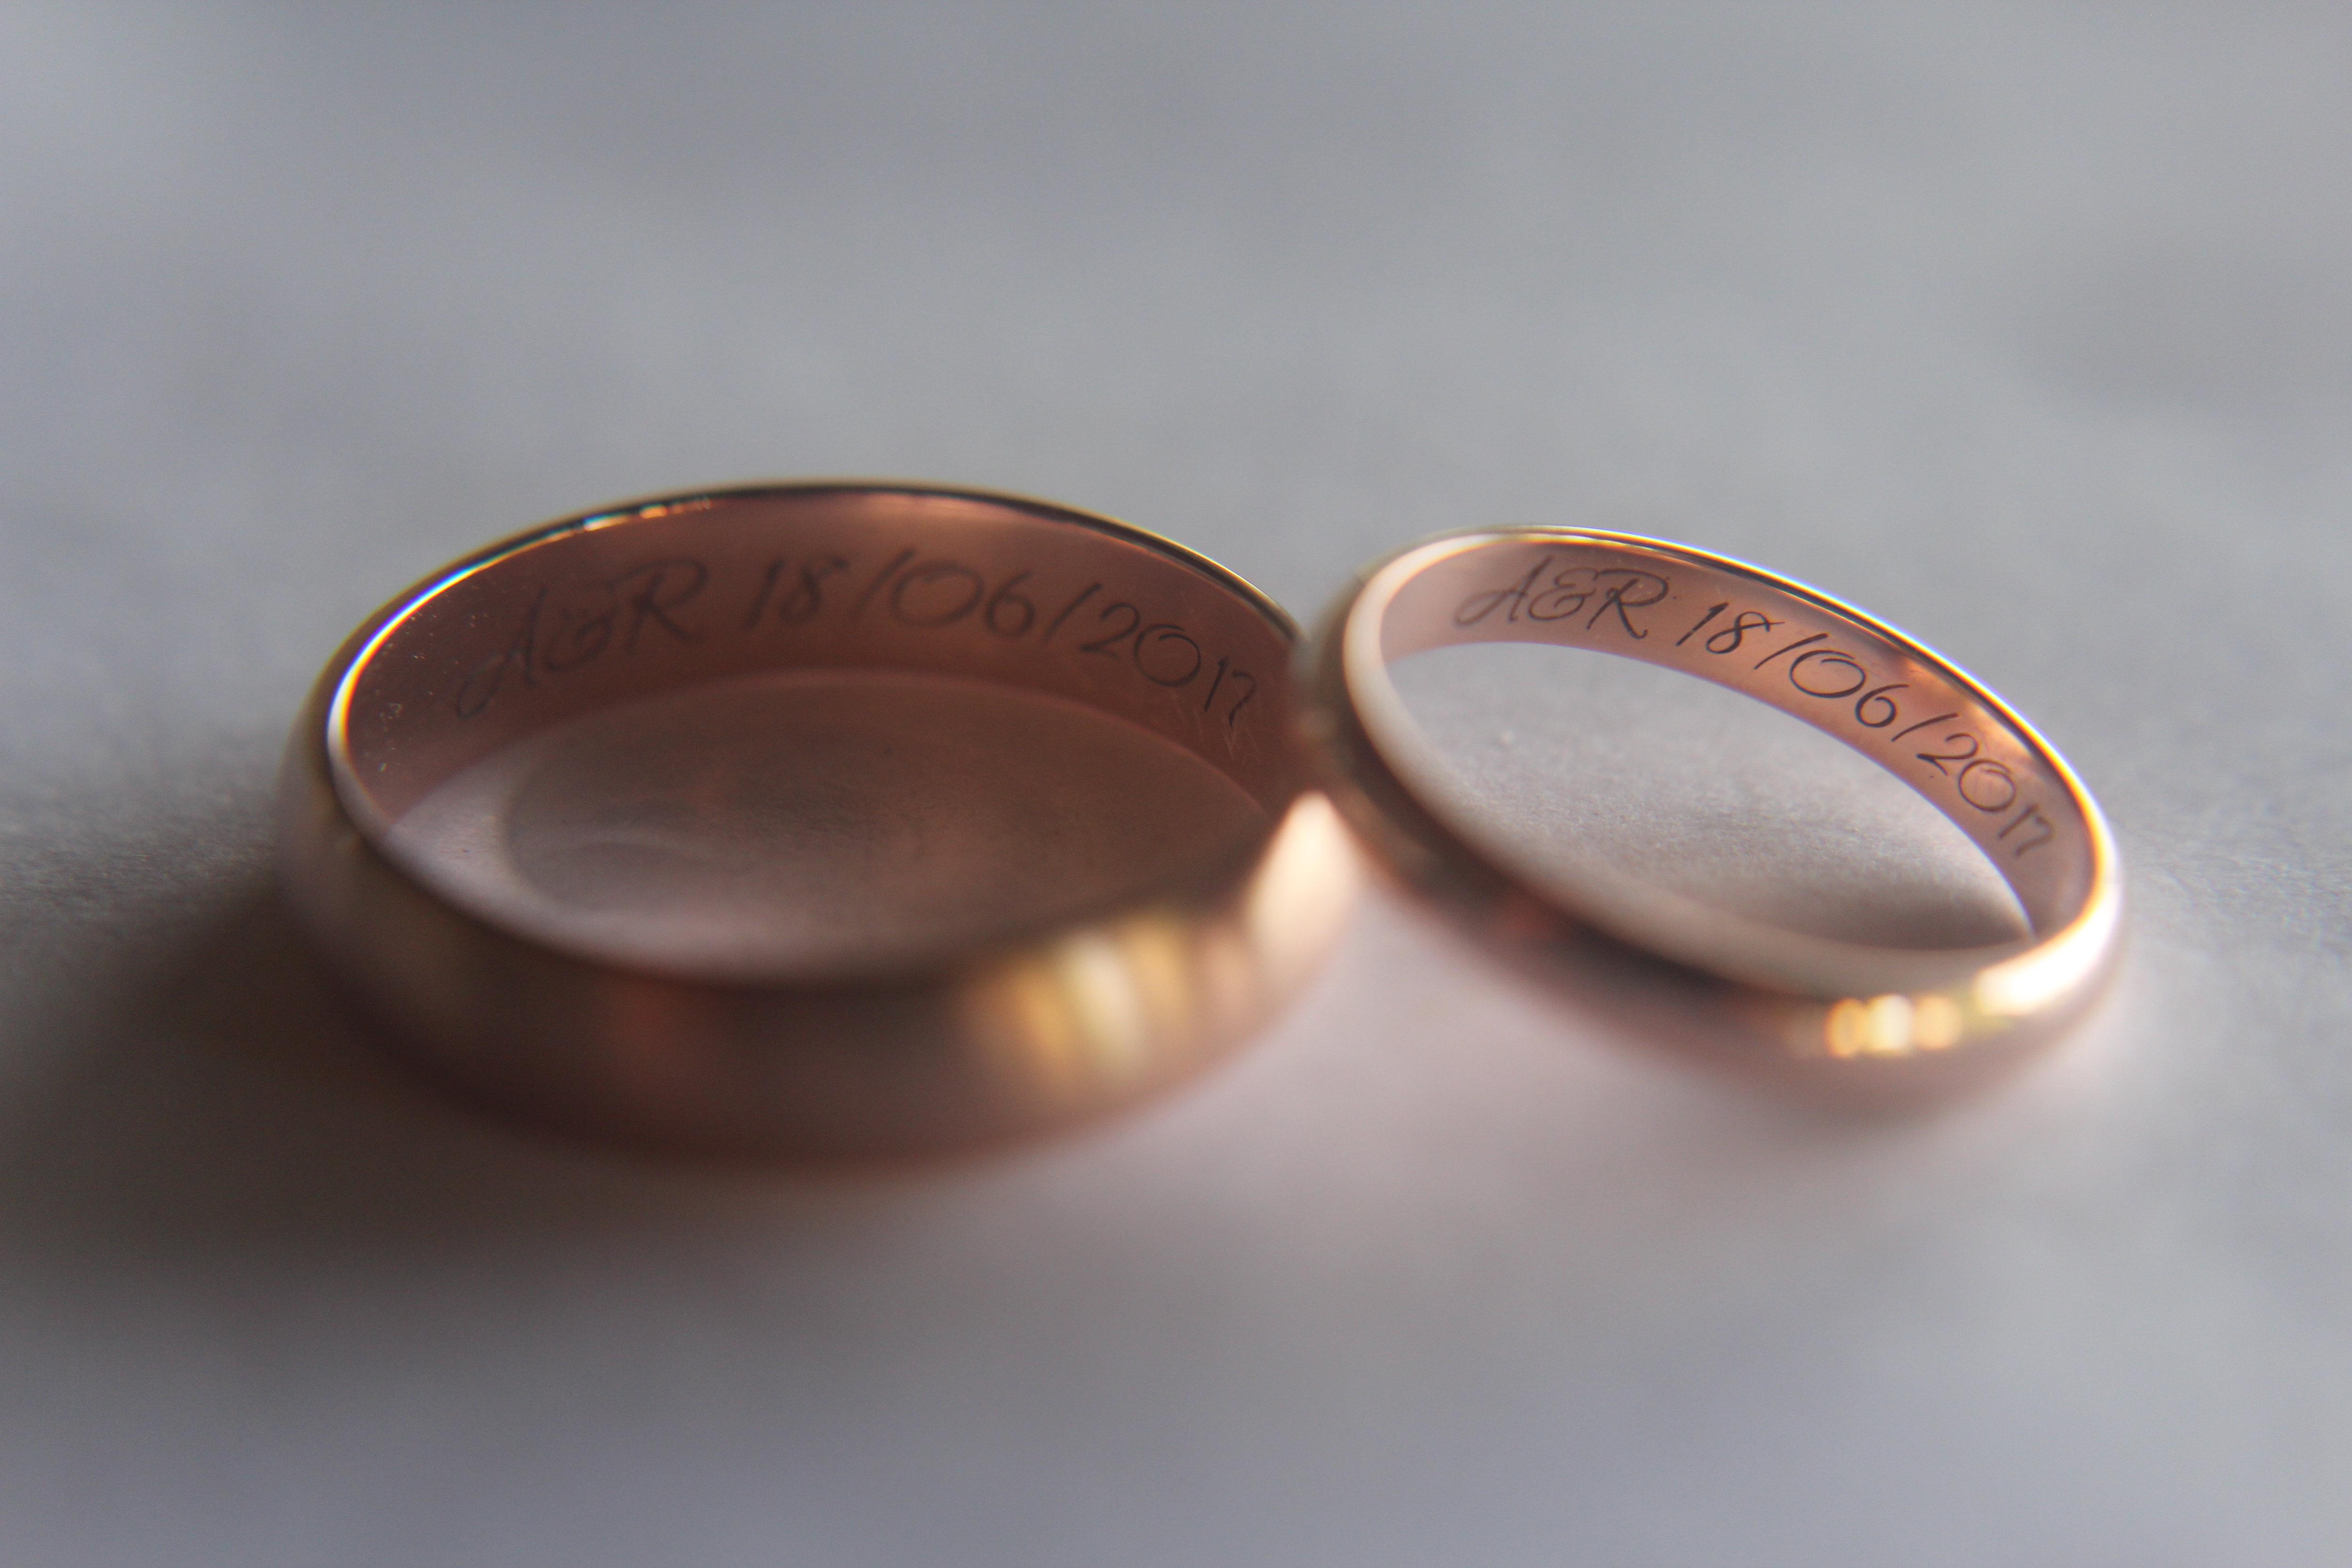 Diamond Engagement Wedding Rings Fashion Jewellery Qirat